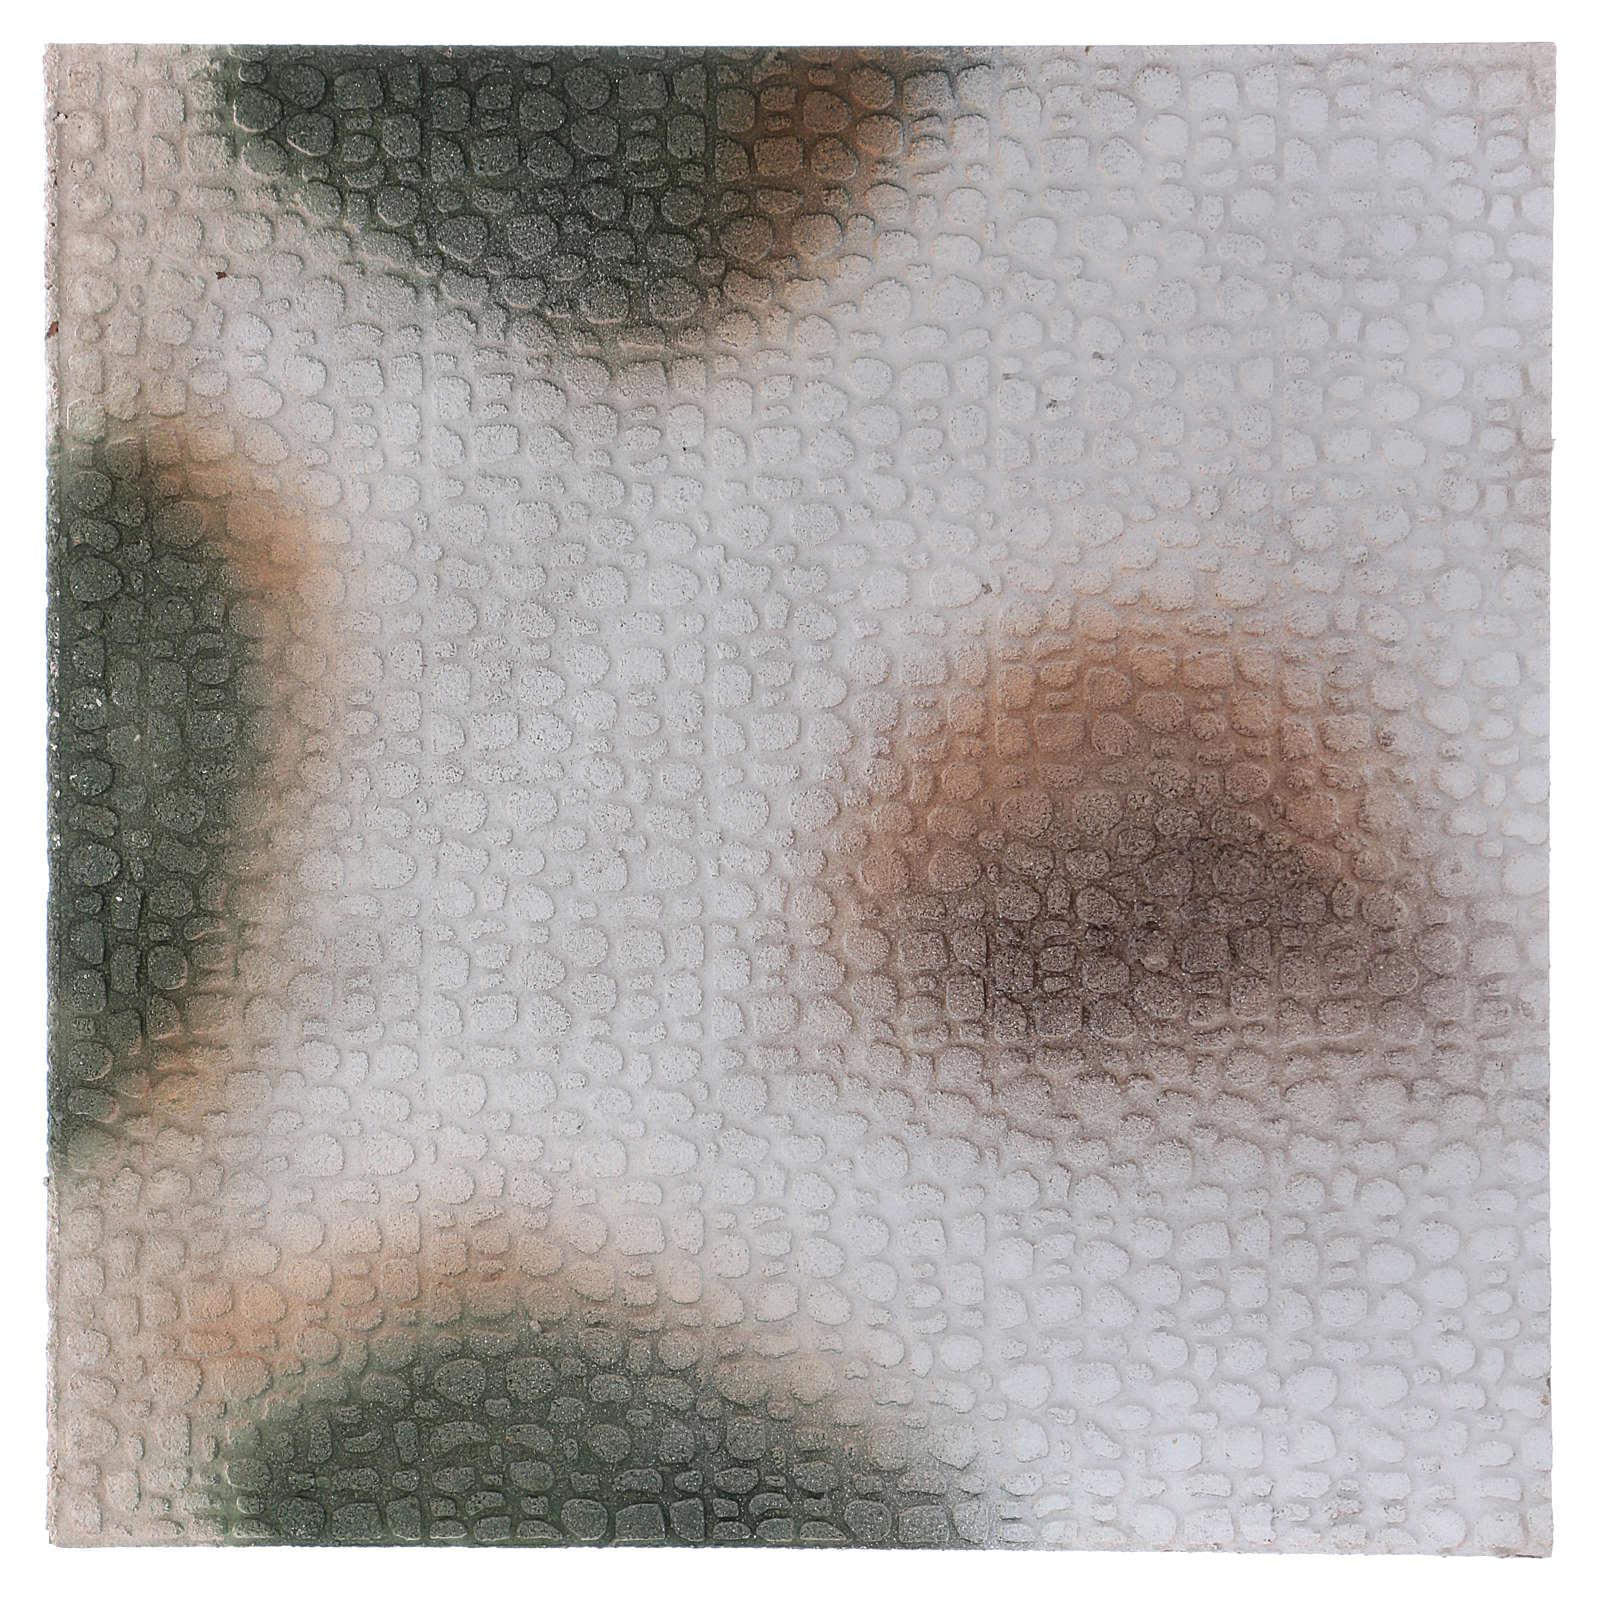 Base 1x50x50 cm de corcho para belén árabe 10 cm de altura media 4